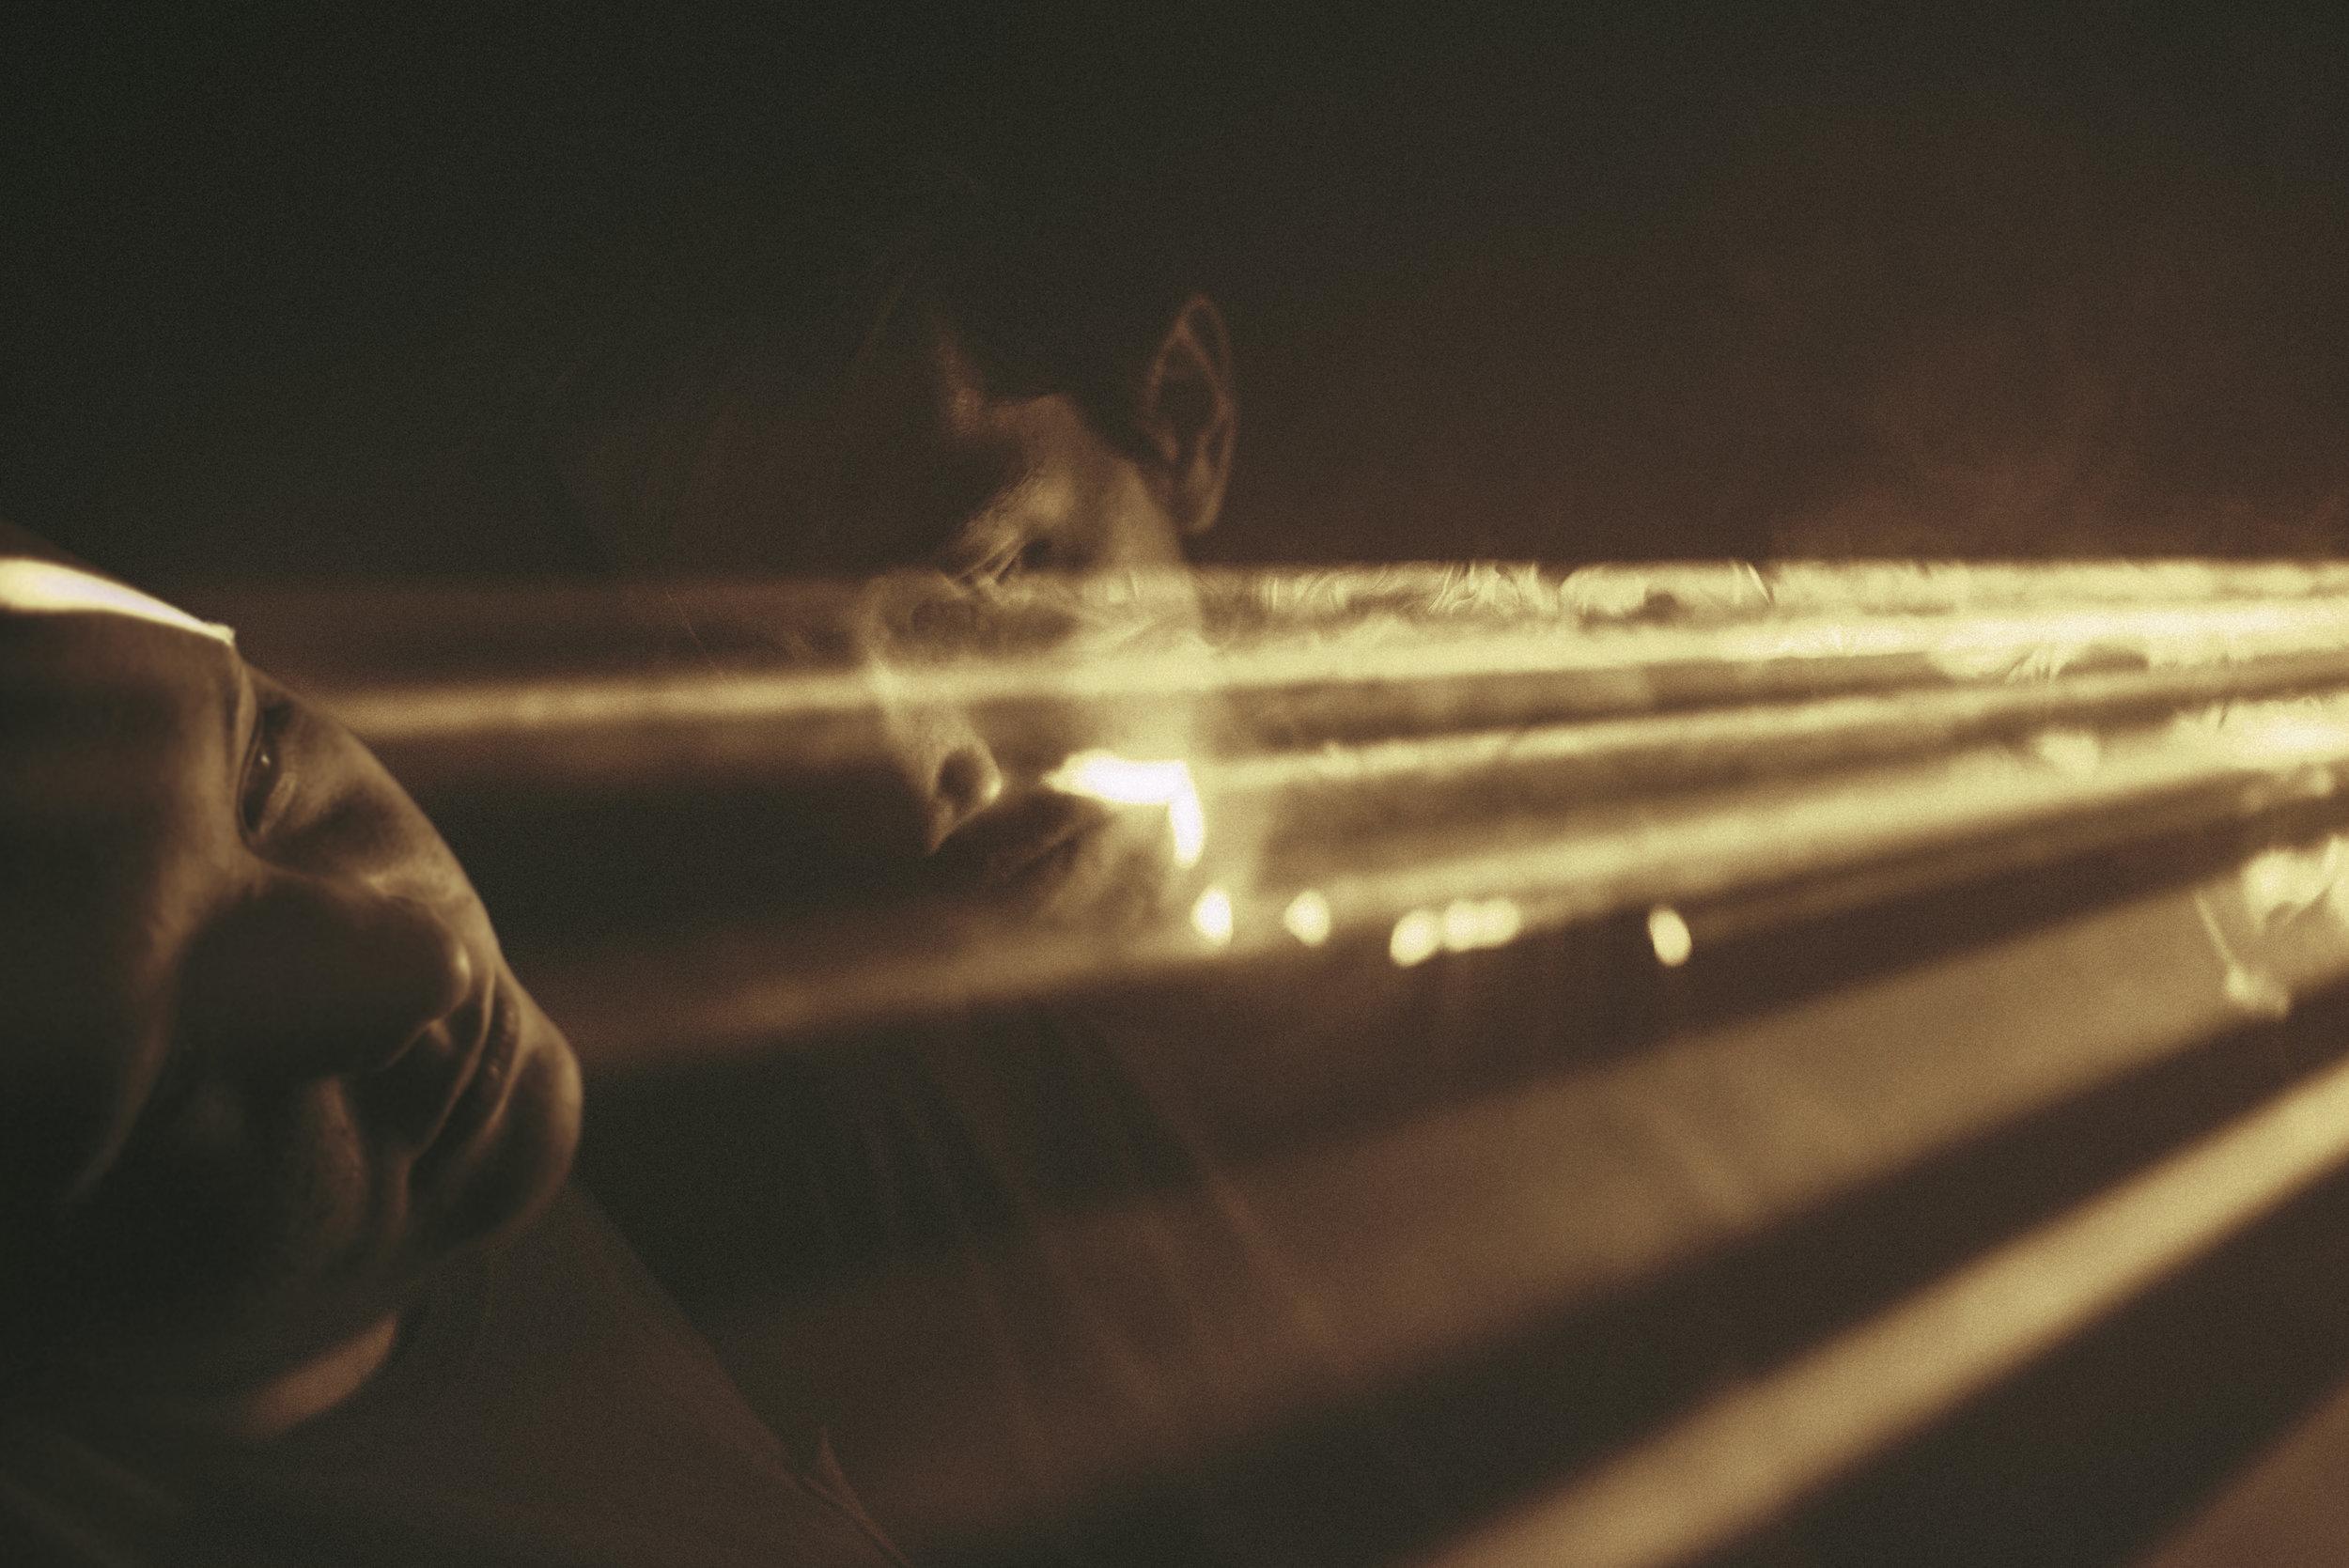 B_f___9865 laser.jpg